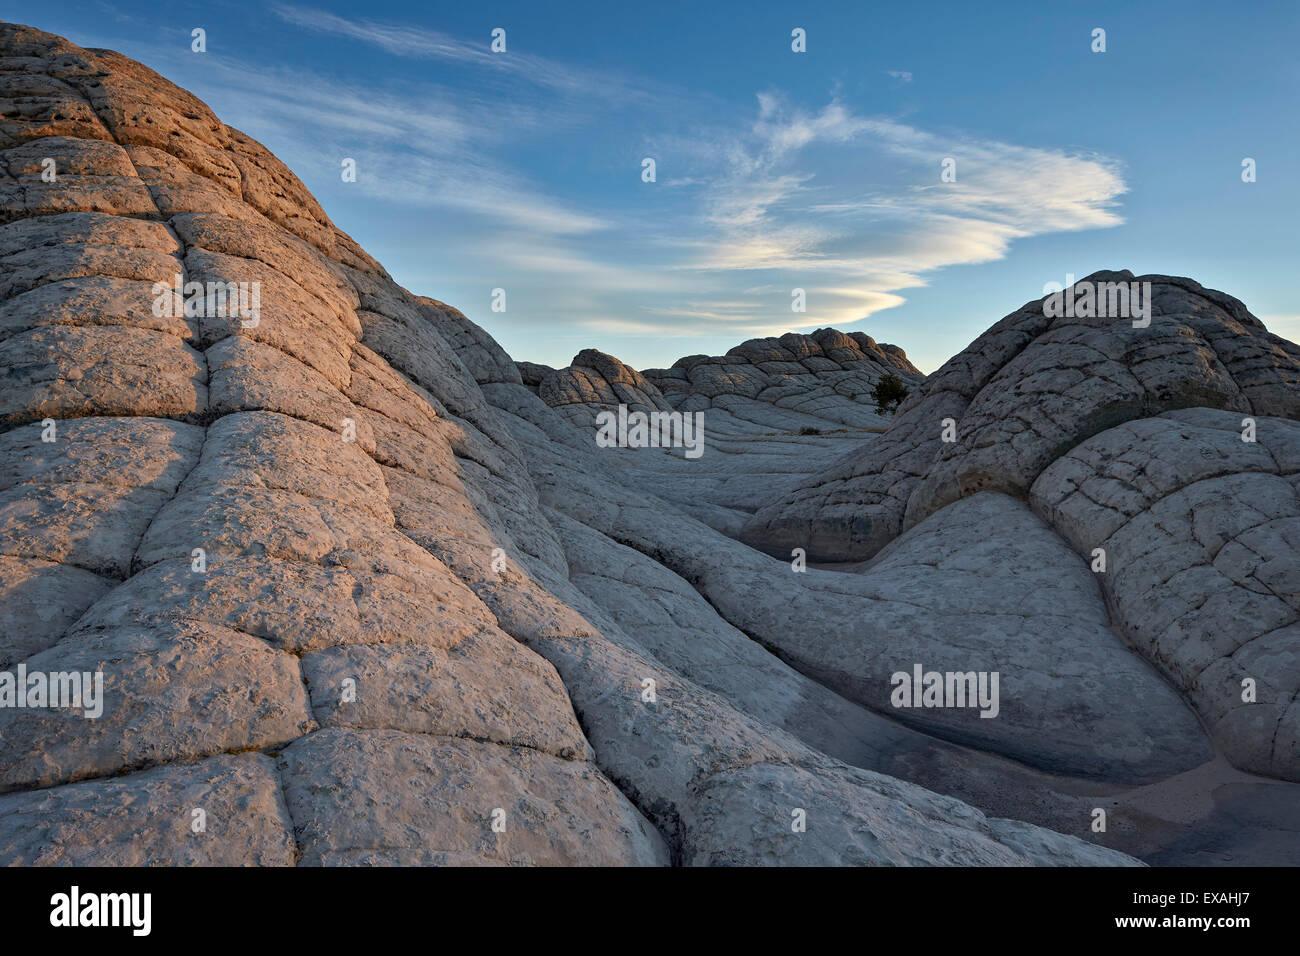 Waves of Brain Rock, White Pocket, Vermilion Cliffs National Monument, Arizona, United States of America, North - Stock Image